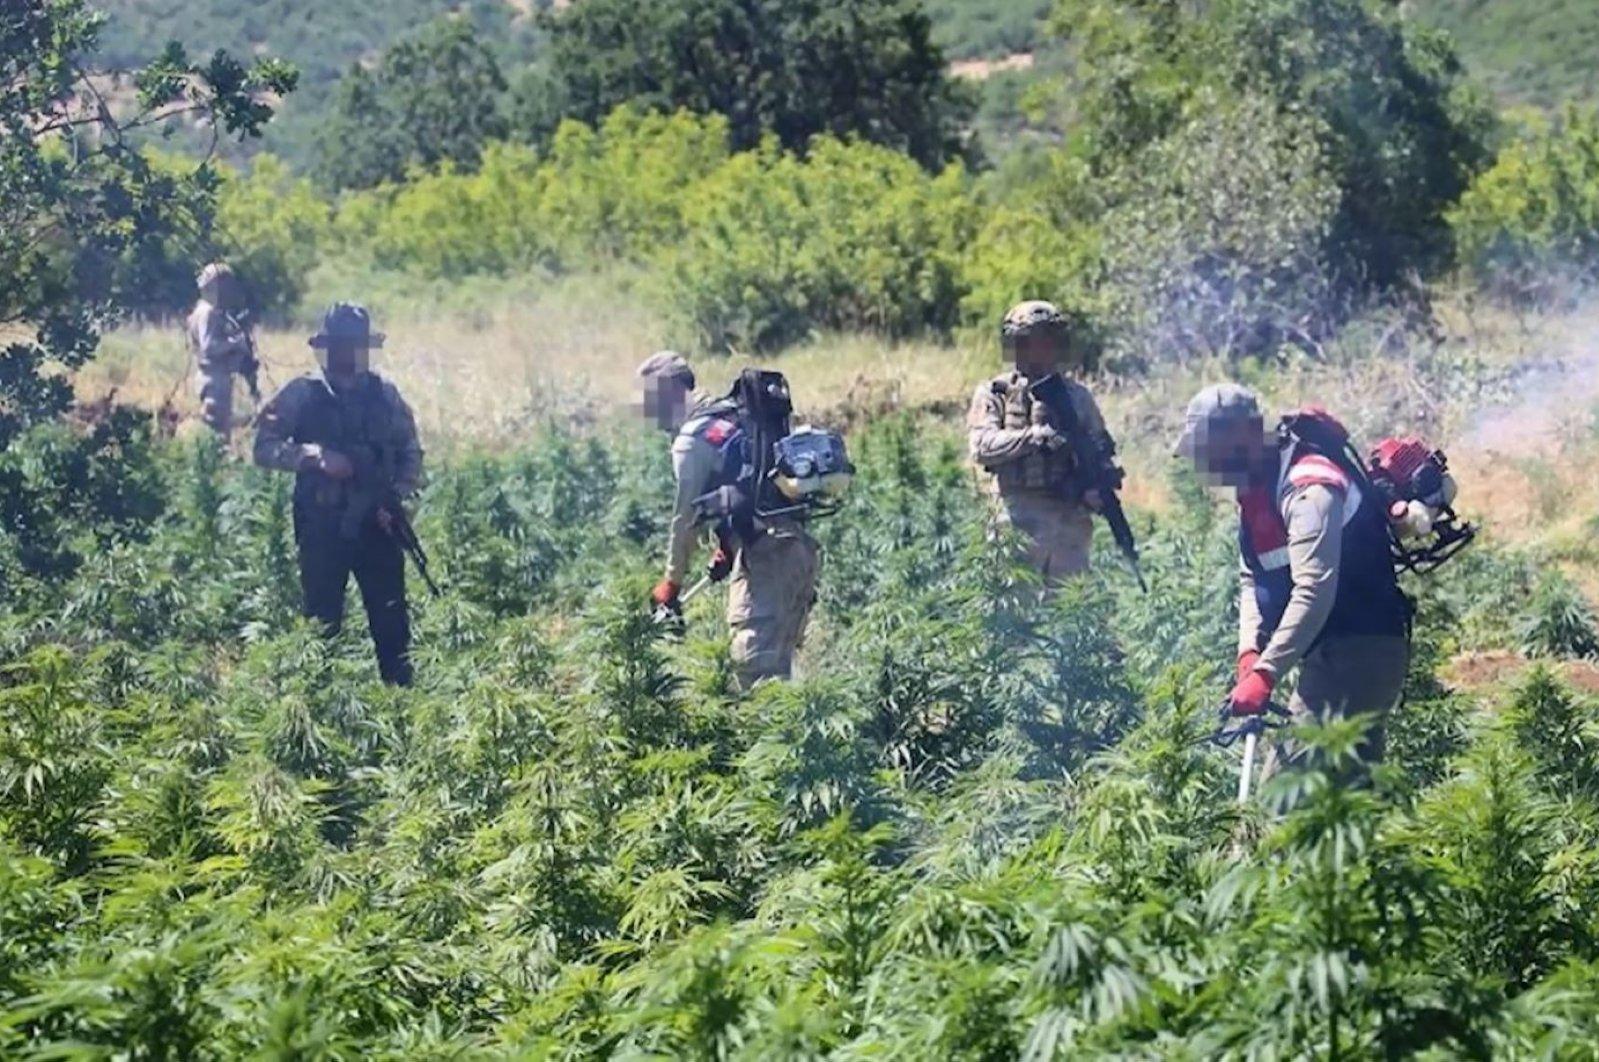 Soldiers destroy the seized cannabis plants, in Diyarbakır, southeastern Turkey, Jun. 8, 2021. (DHA PHOTO)